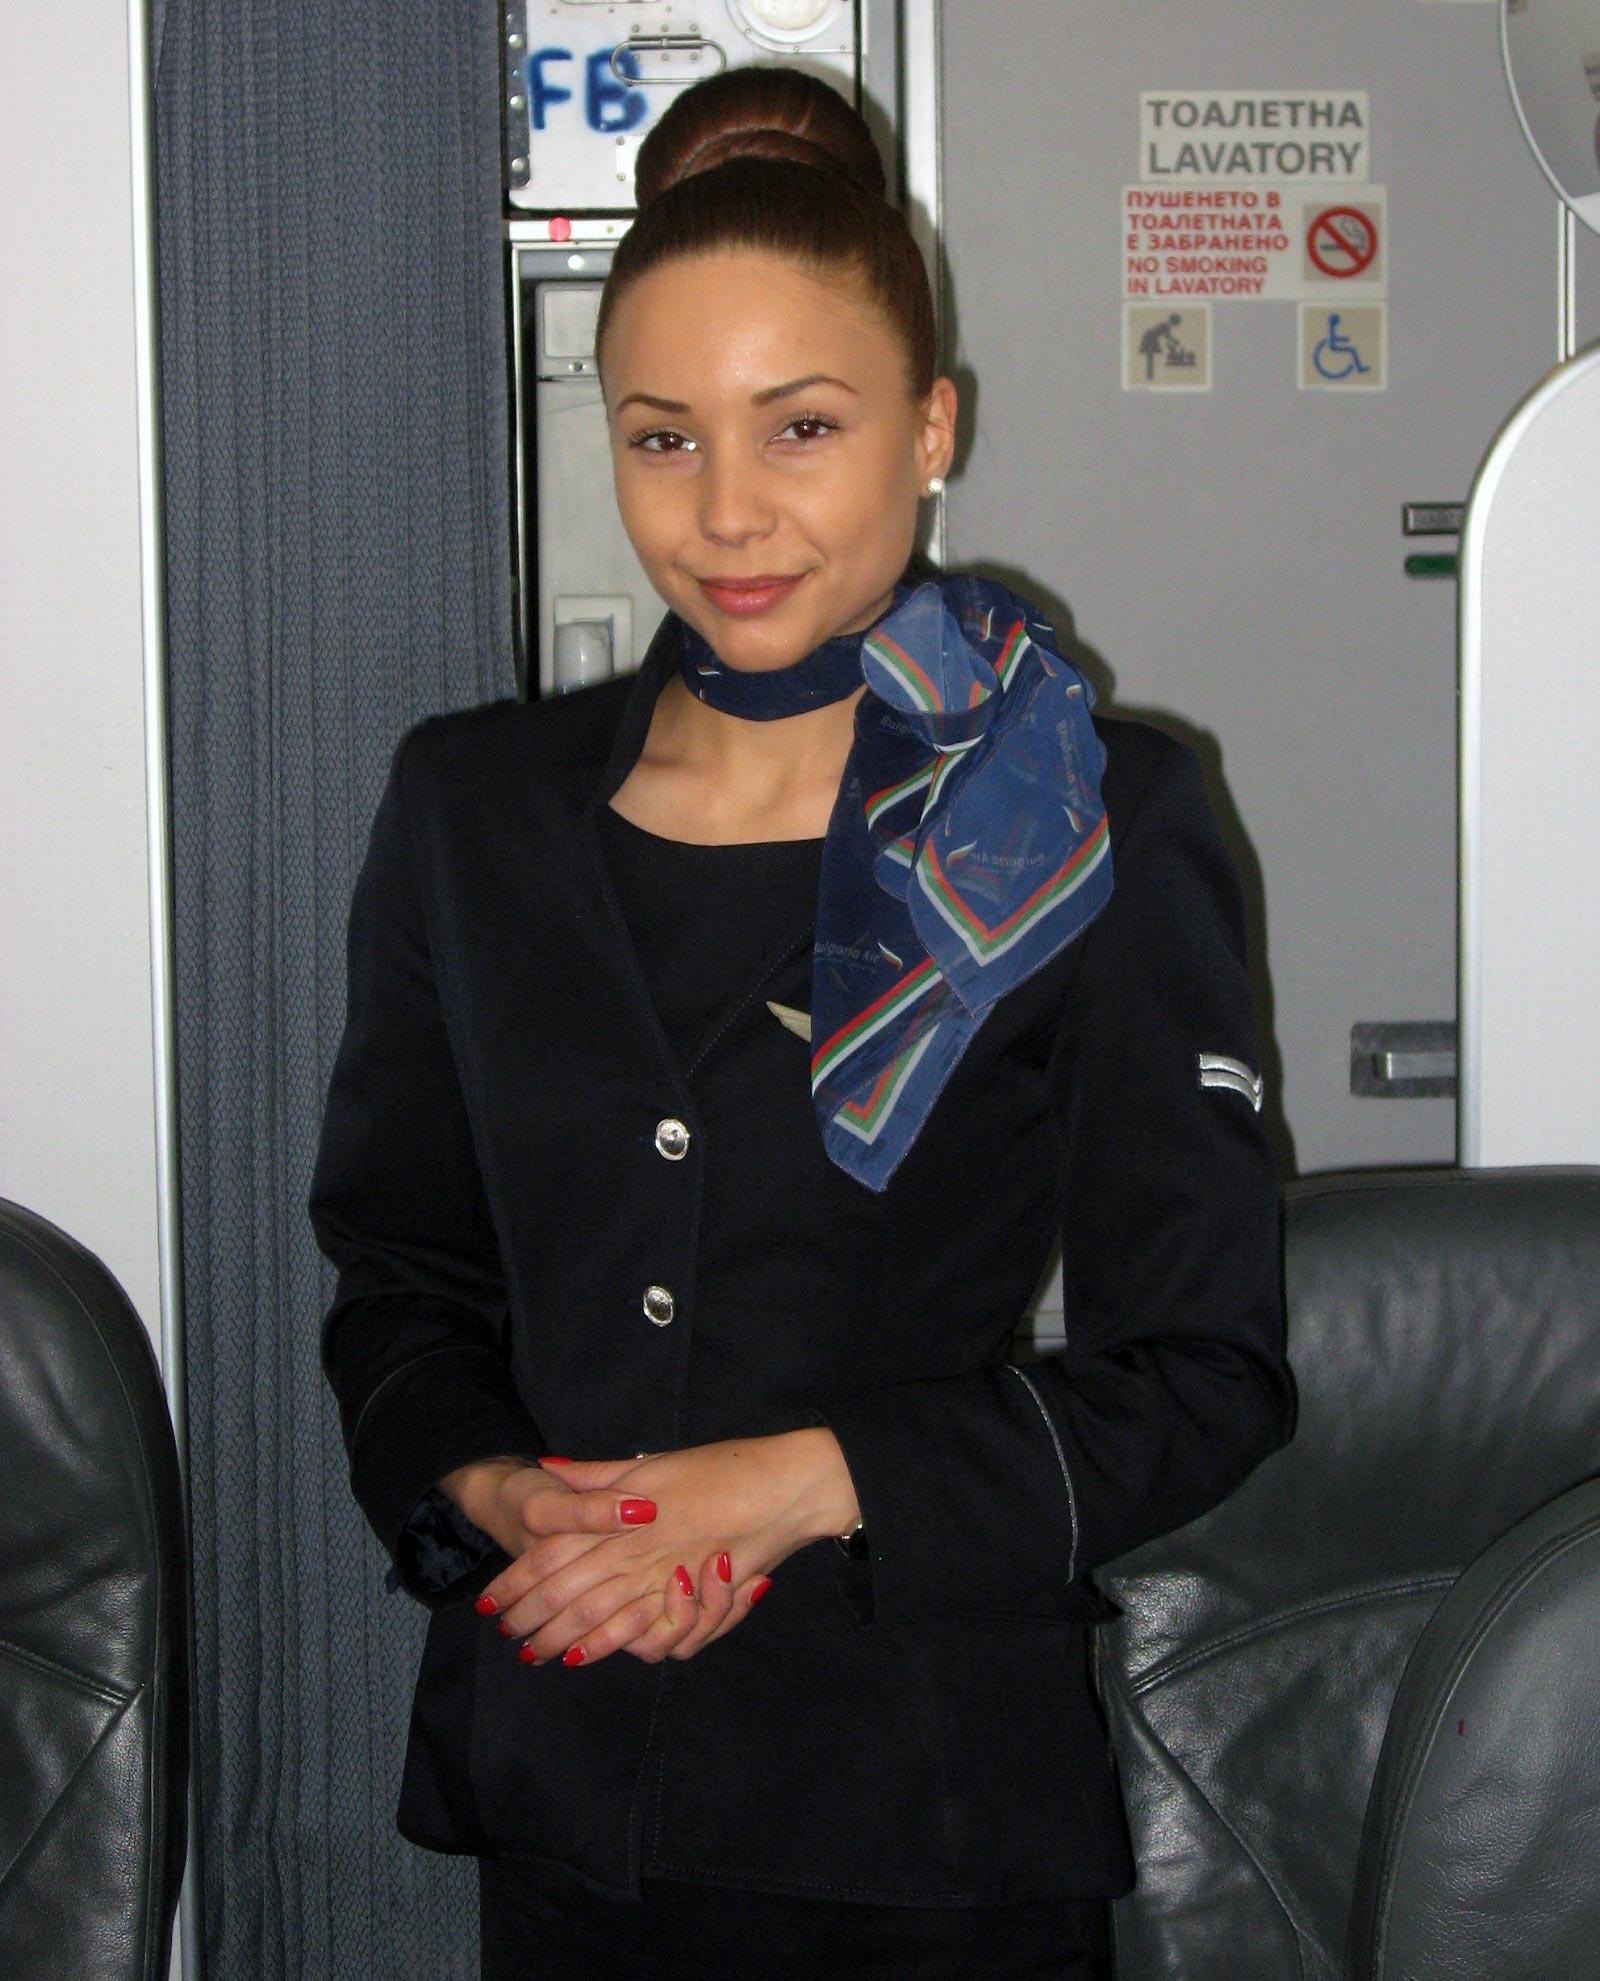 Bulgaria Air cabin attendant